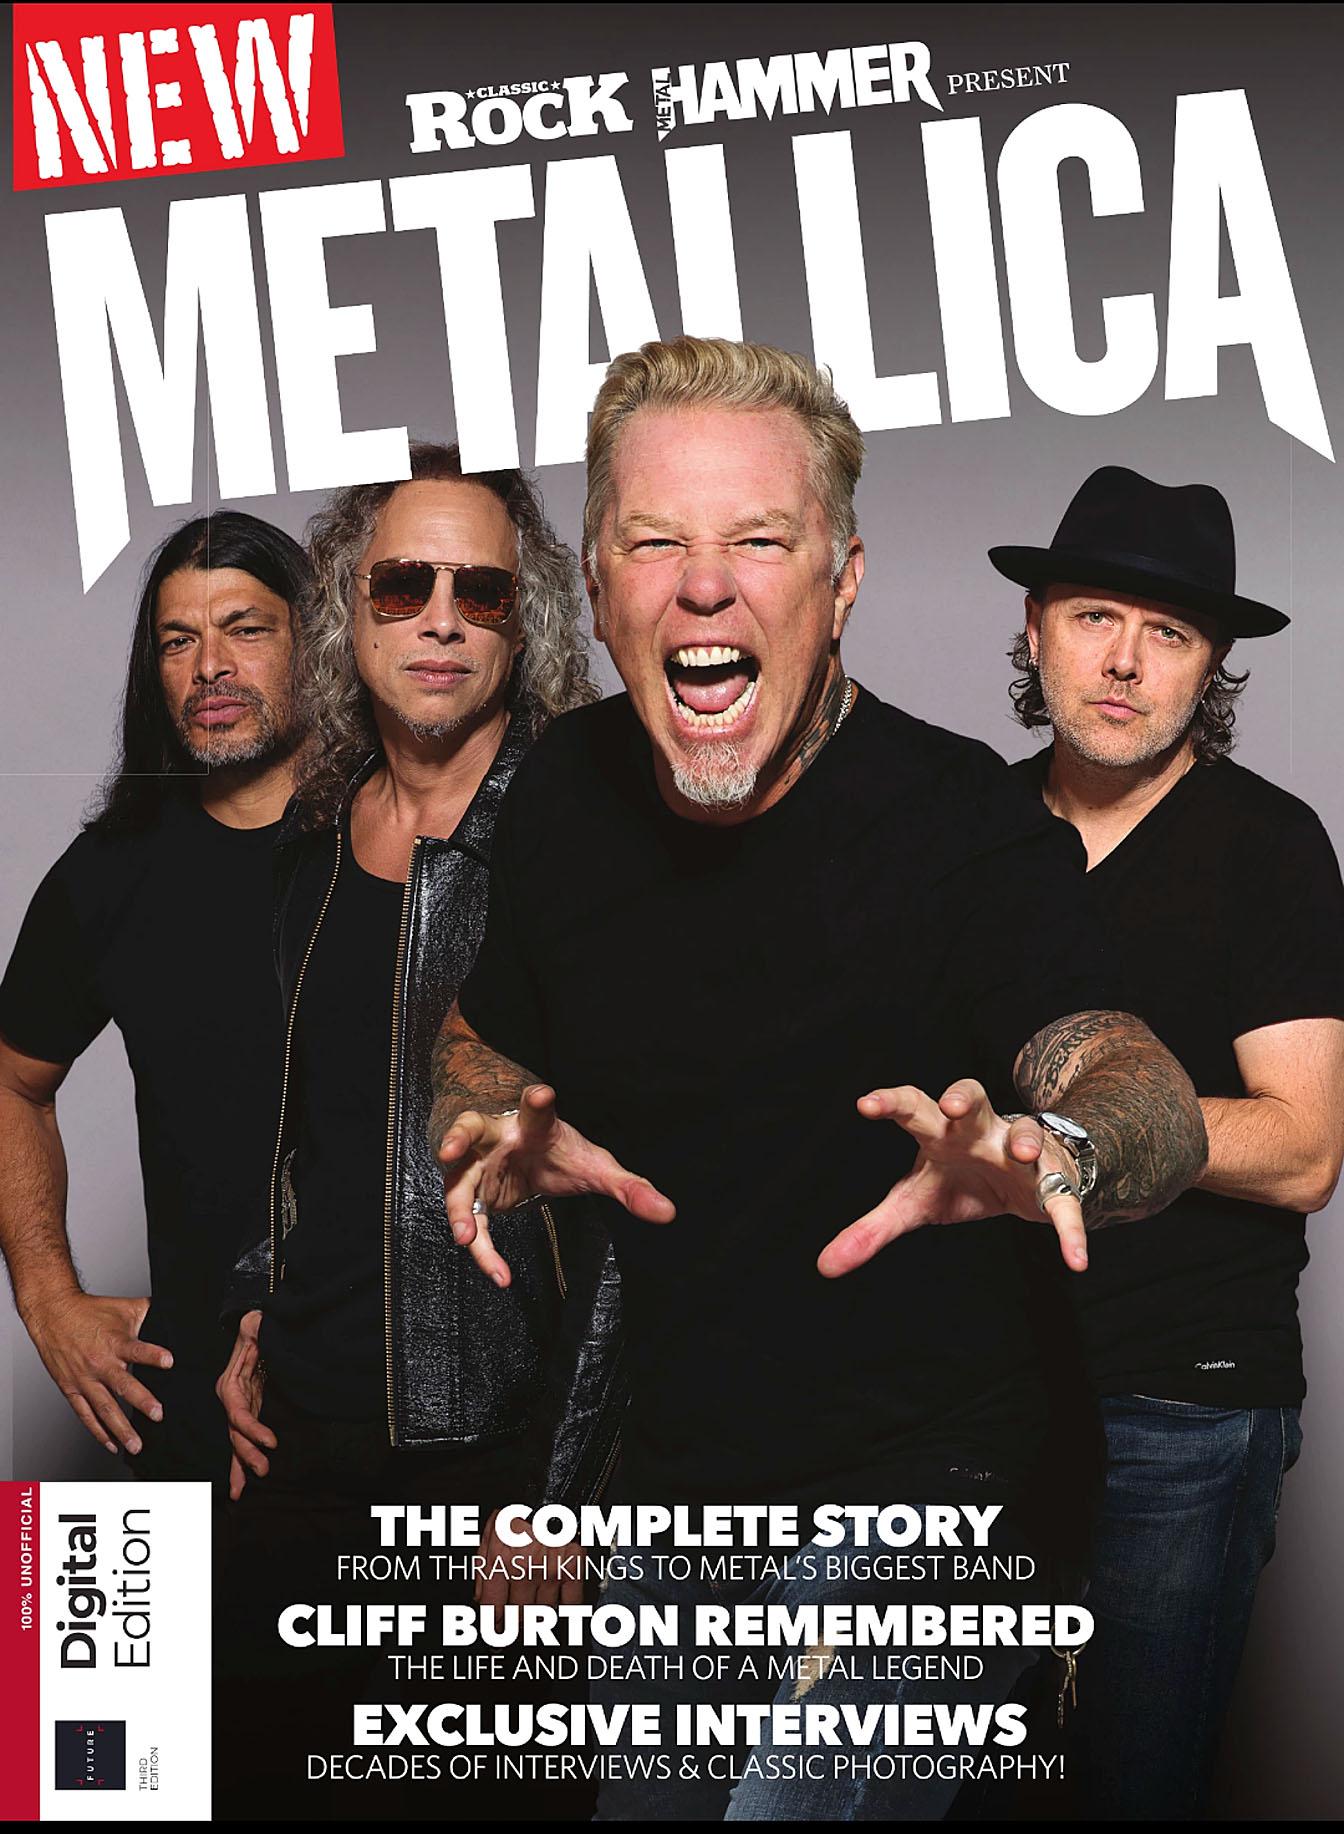 Classic Rock & Metal Hammer Sp Metallica 3rd Ed 2019.jpg